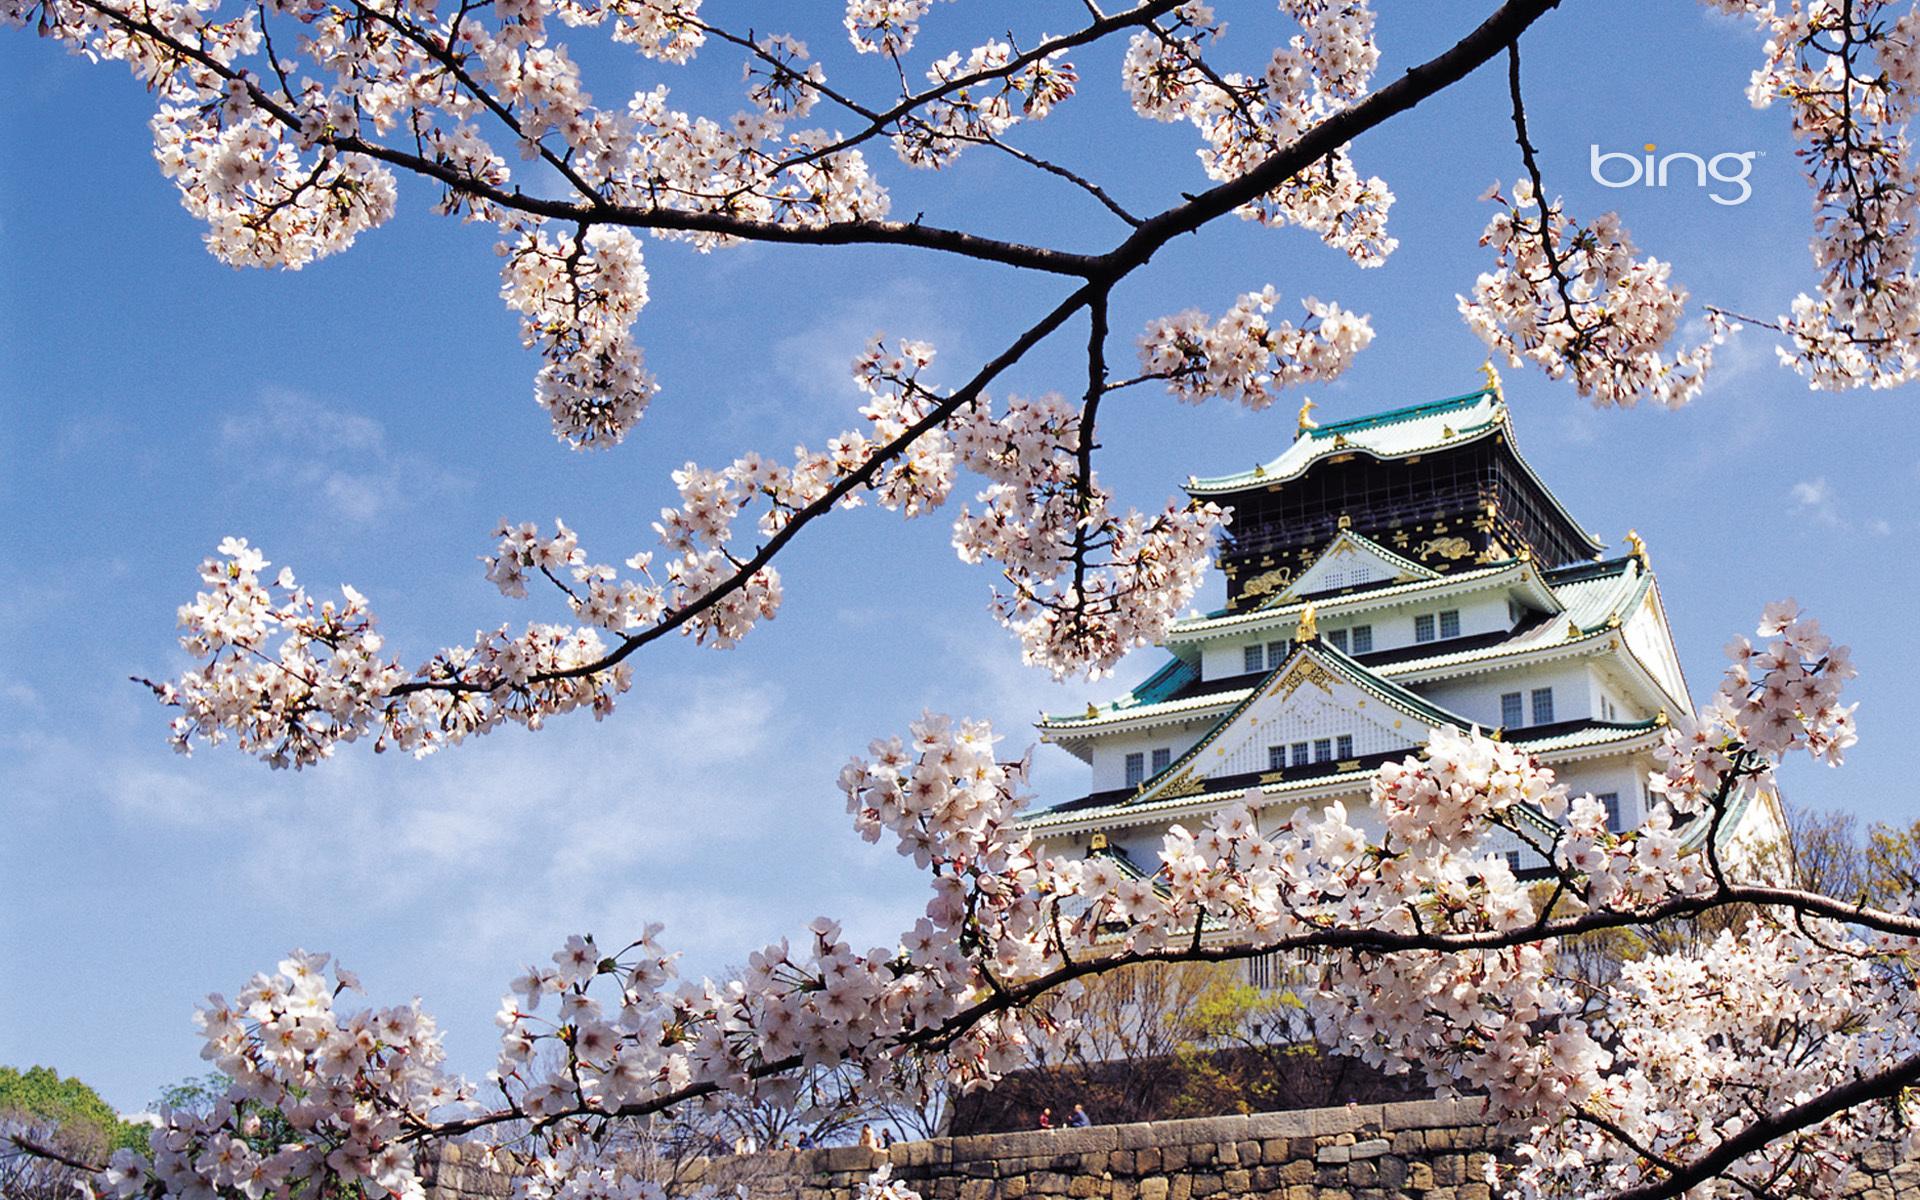 japan architecture wallpaper - photo #48